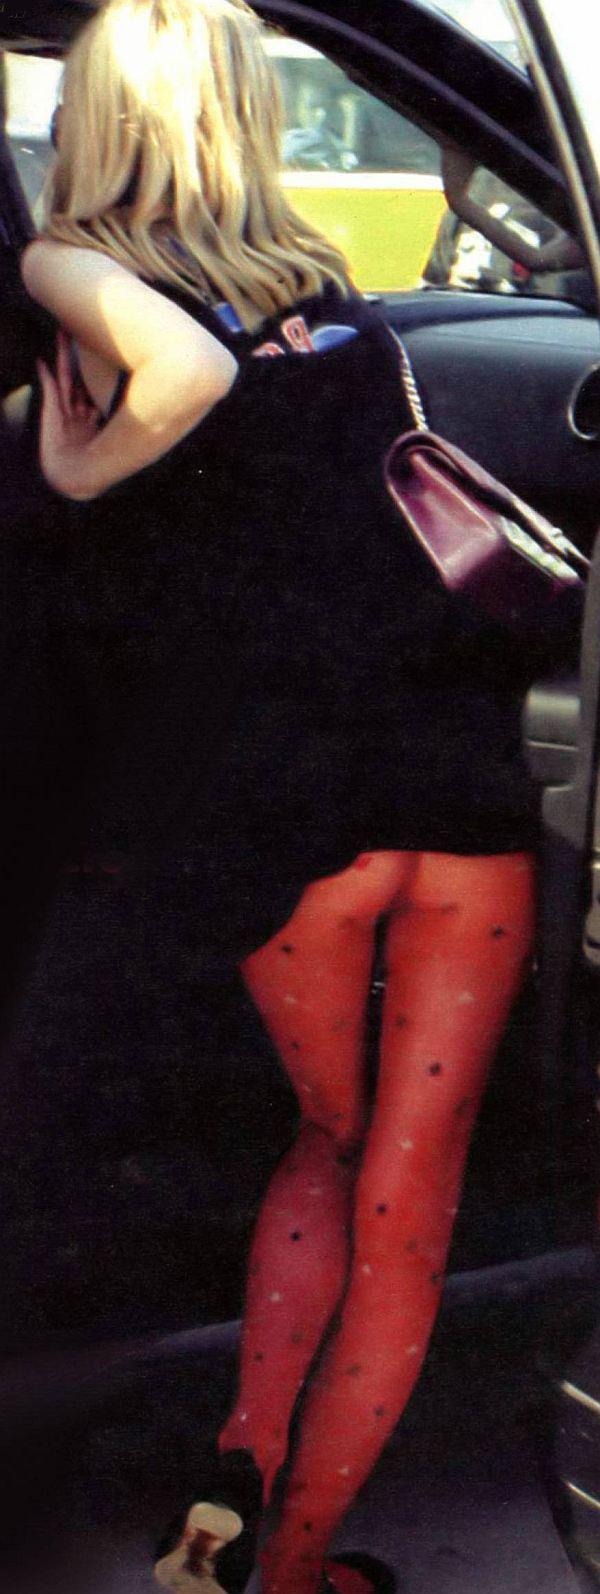 Hania Barton Pantyhose Upskirt, Mischa's Sister Moving Into The Edge Of The Spotlight